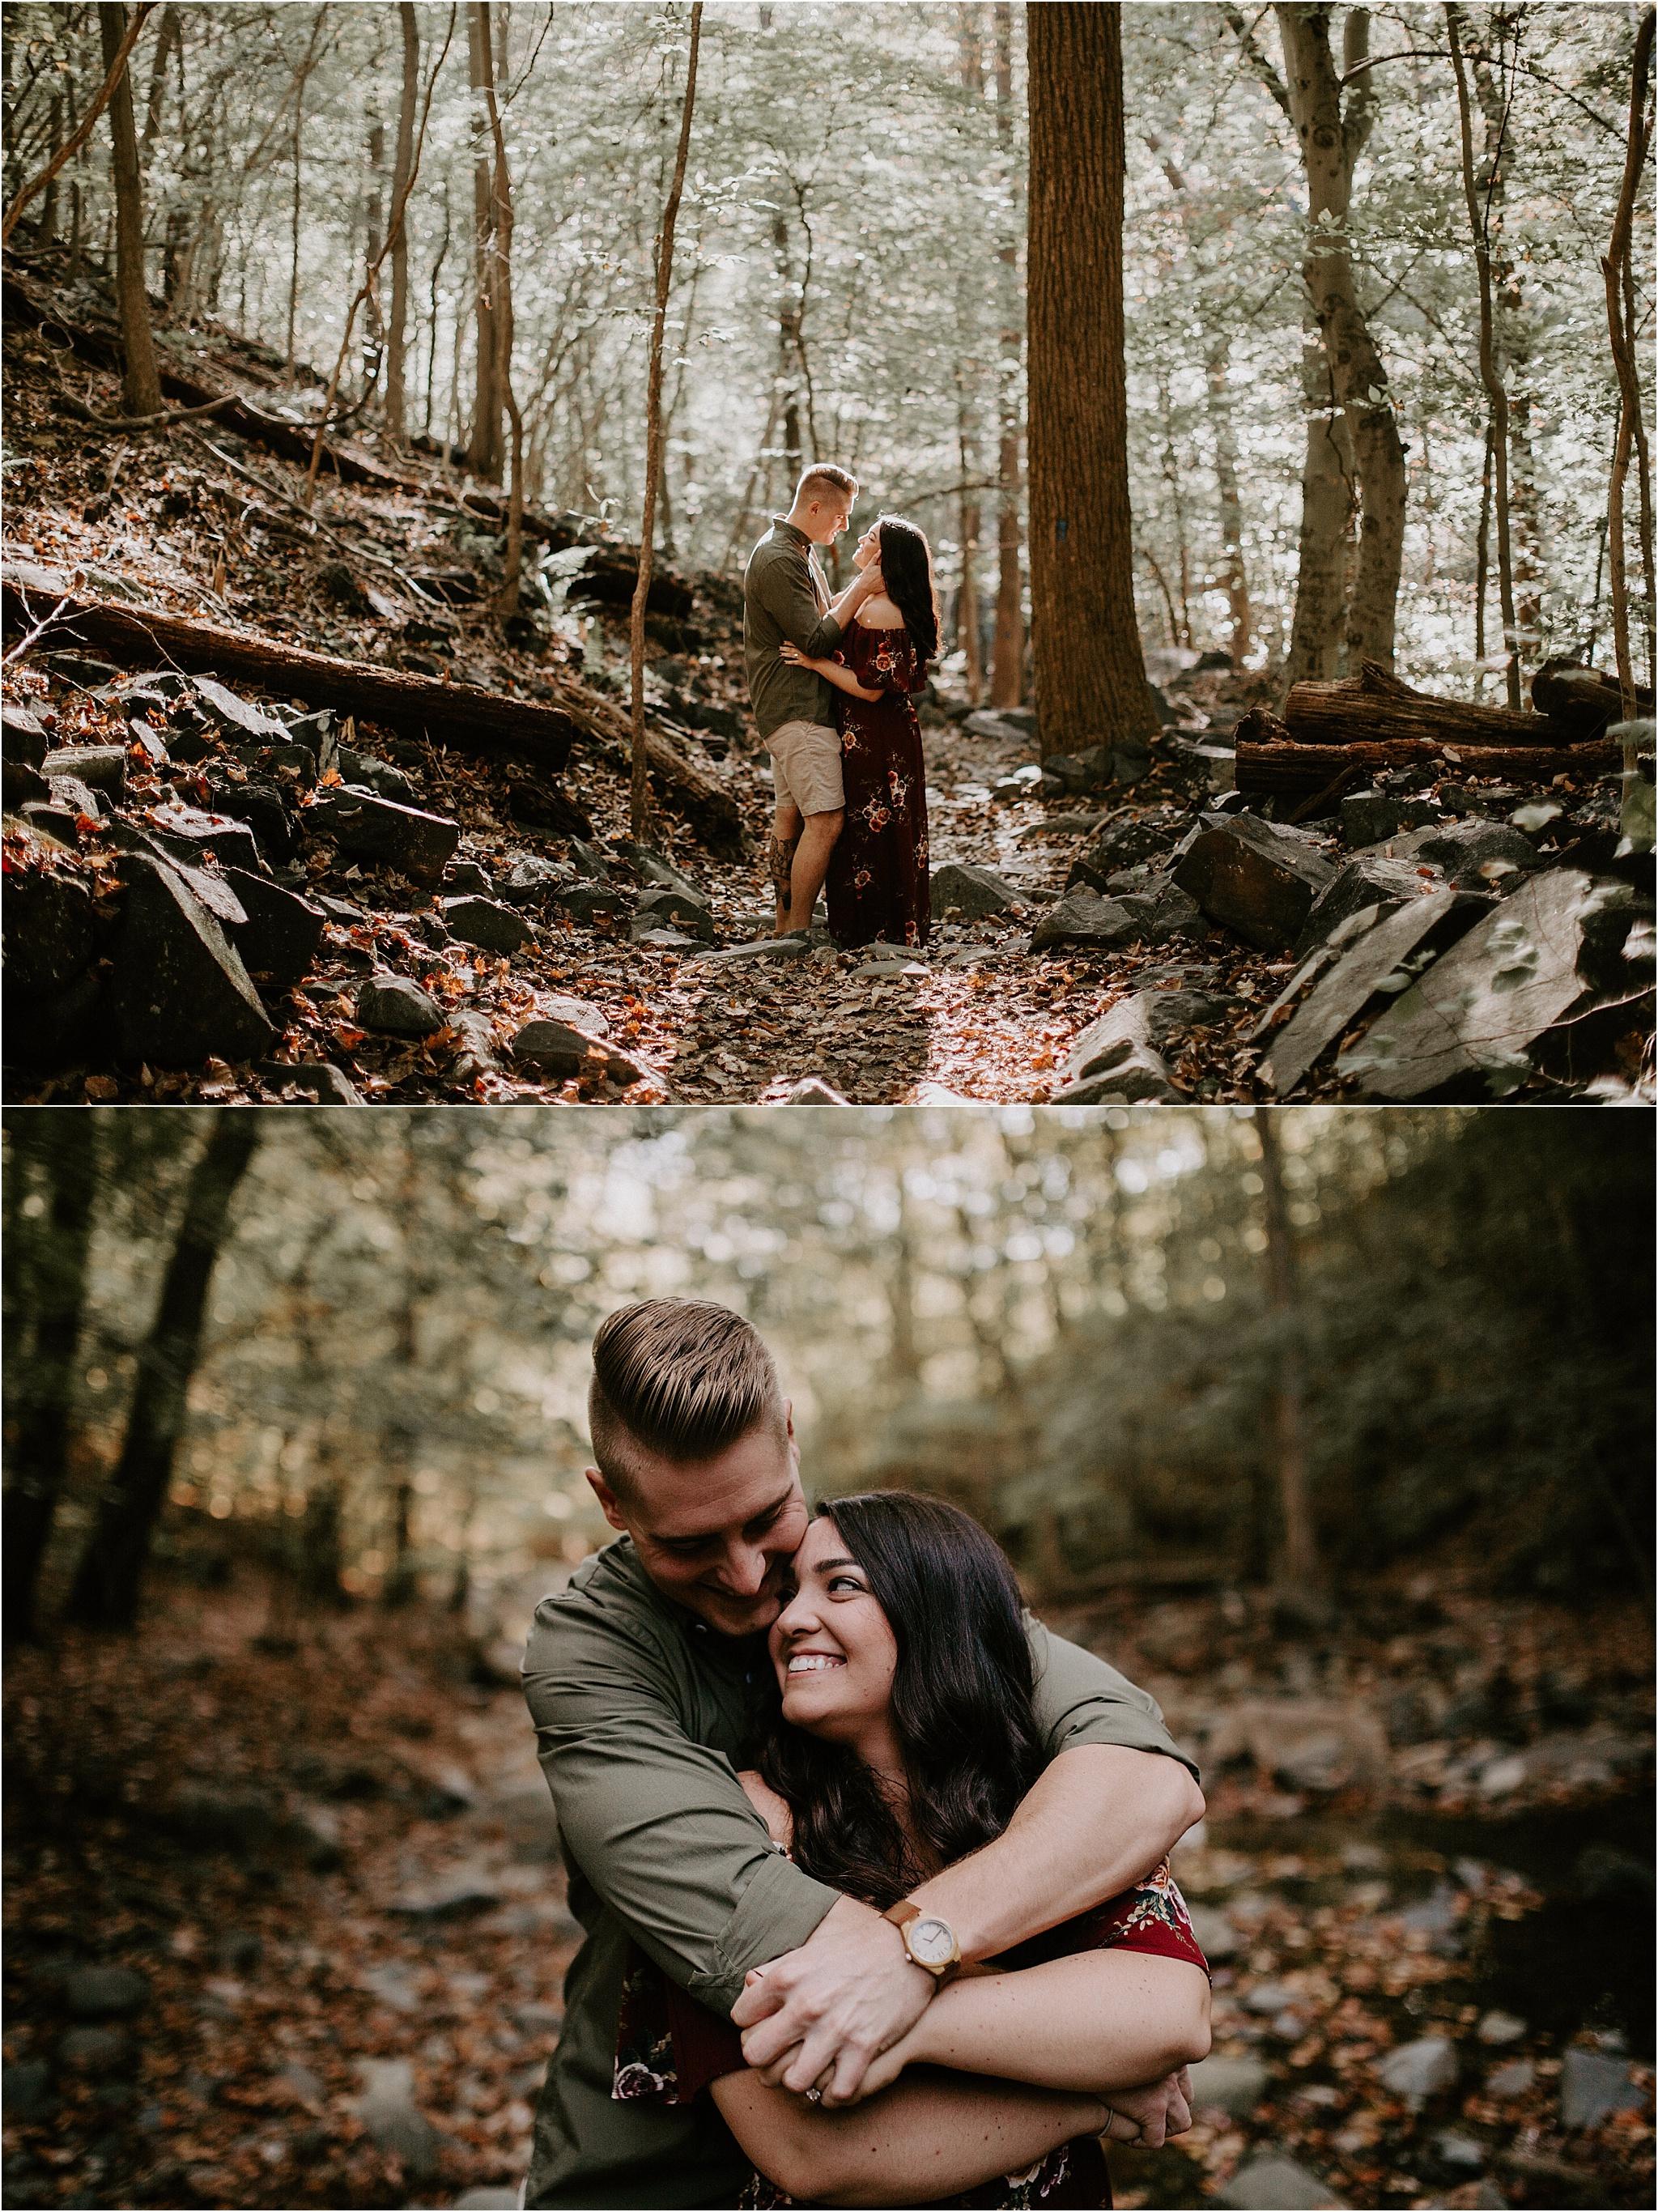 Sarah_Brookhart_Baltimore_Philly_Wedding_Photographer_0002-1.jpg